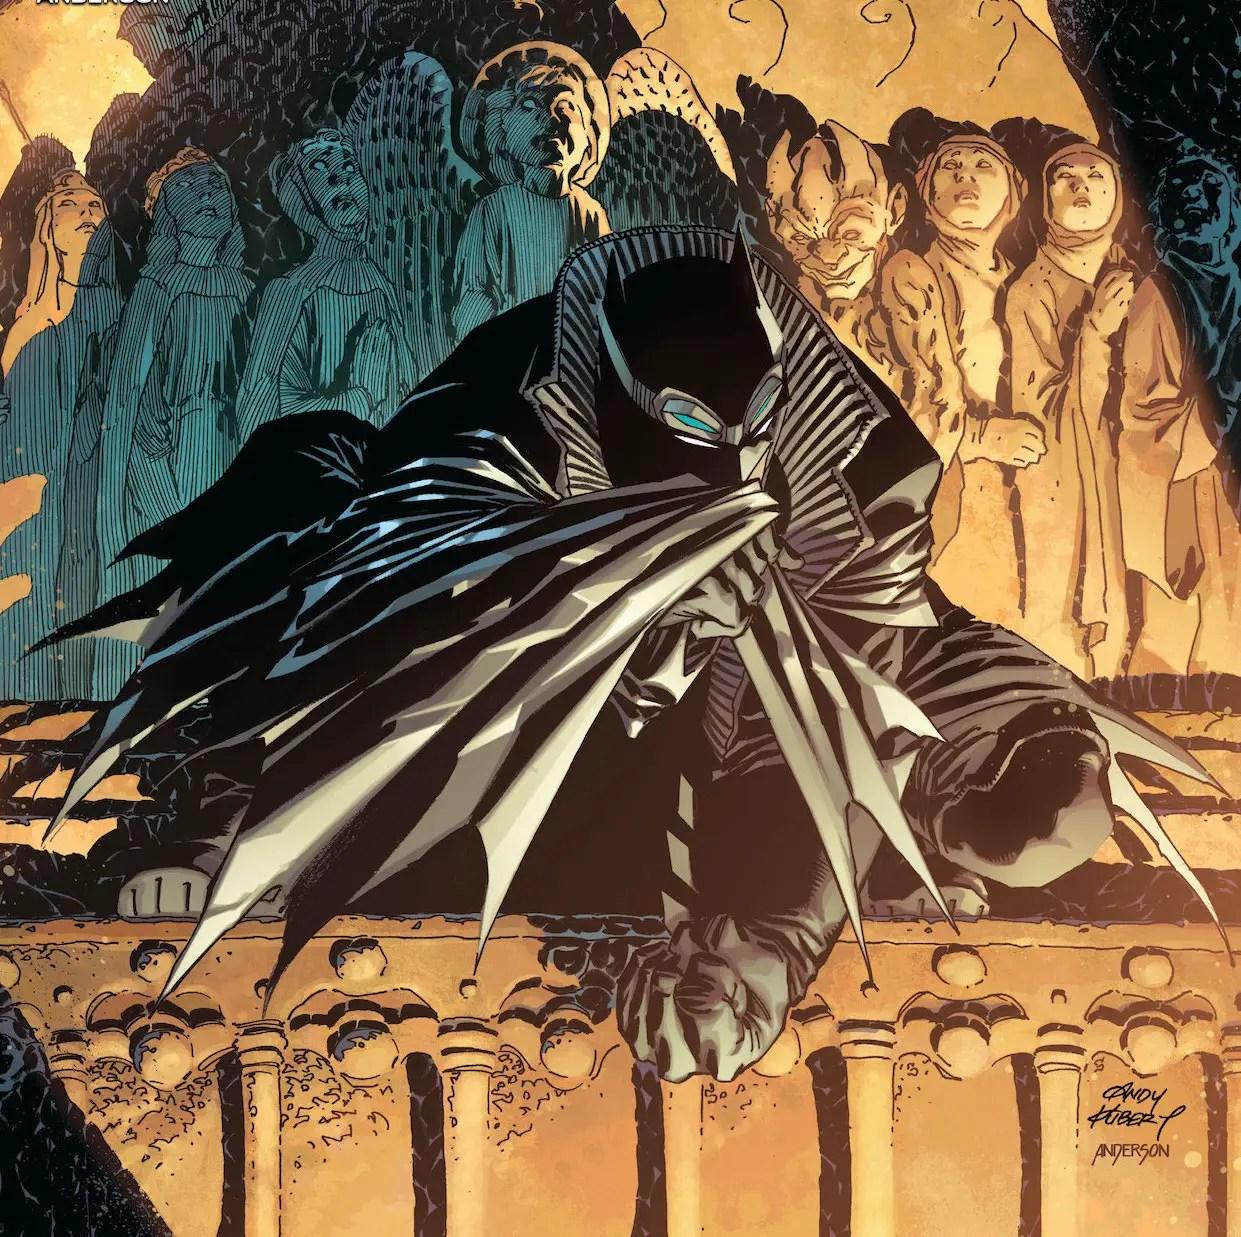 'Batman: The Detective' #2 is just plain cool comics